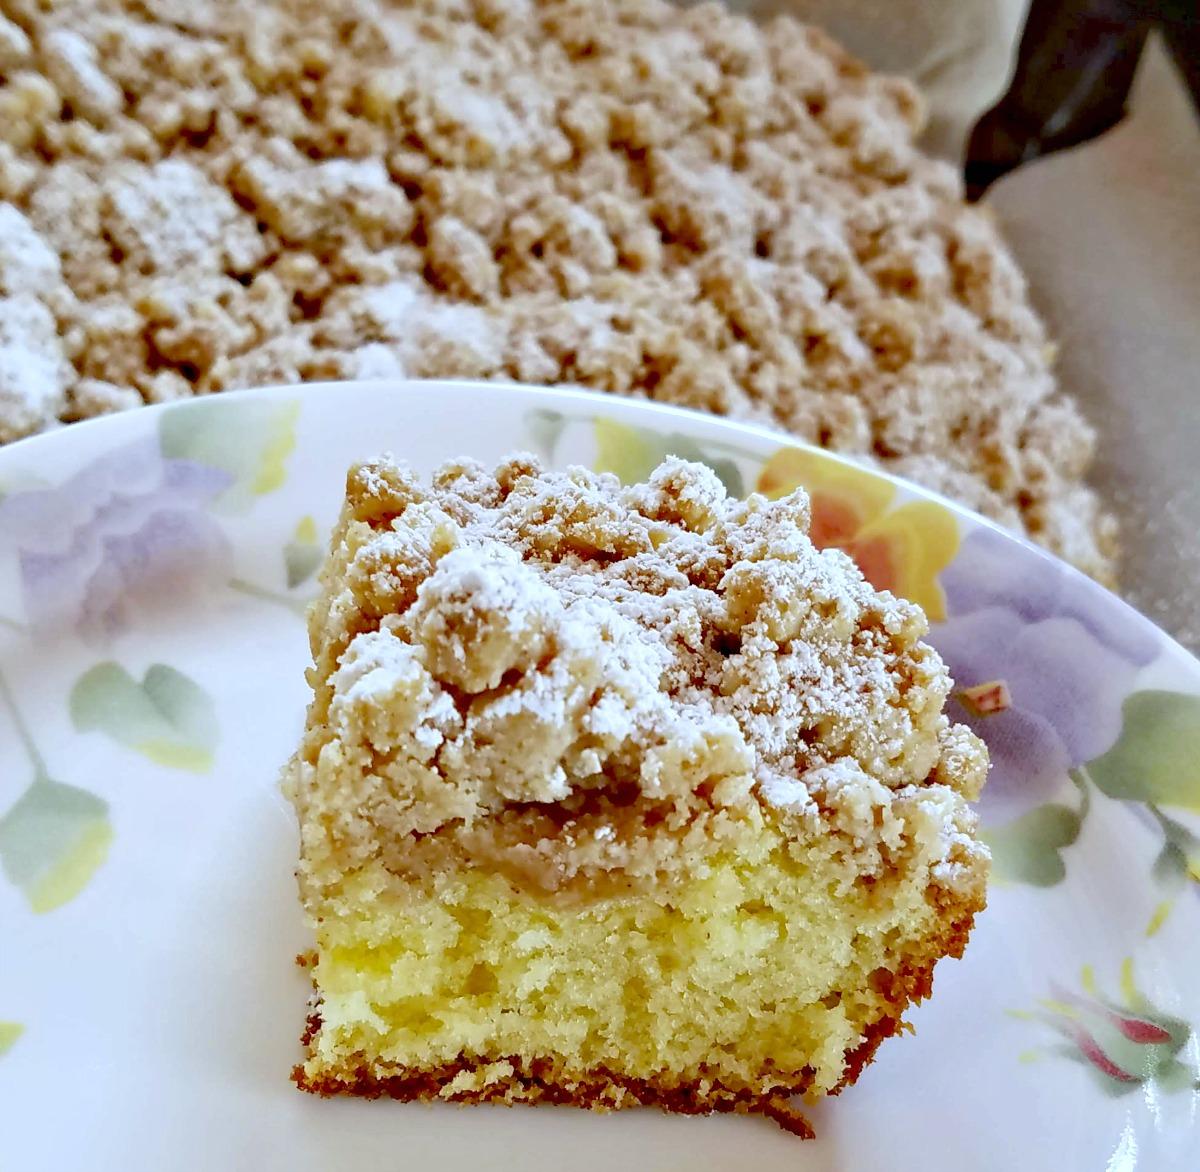 New York Crumb Cake, crumb cake, crumb cake recipe